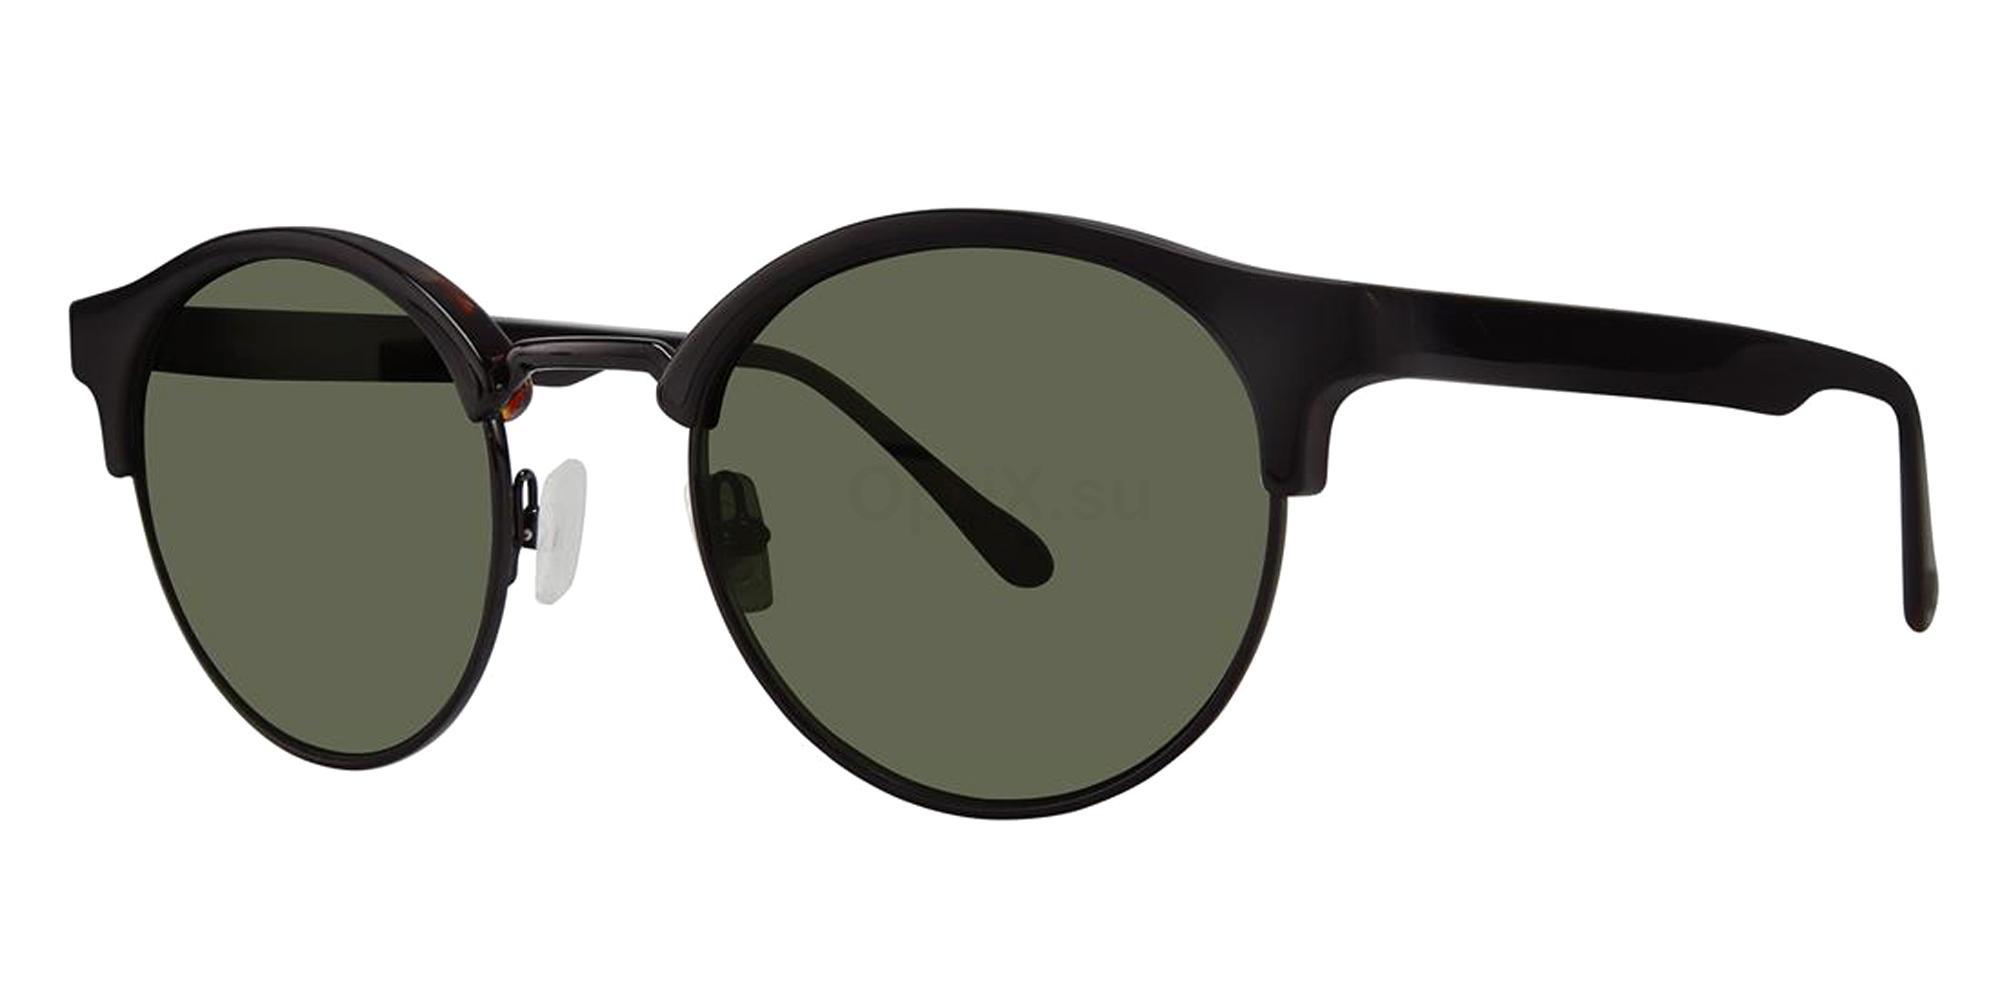 Black SIEGAL Sunglasses, Zac Posen